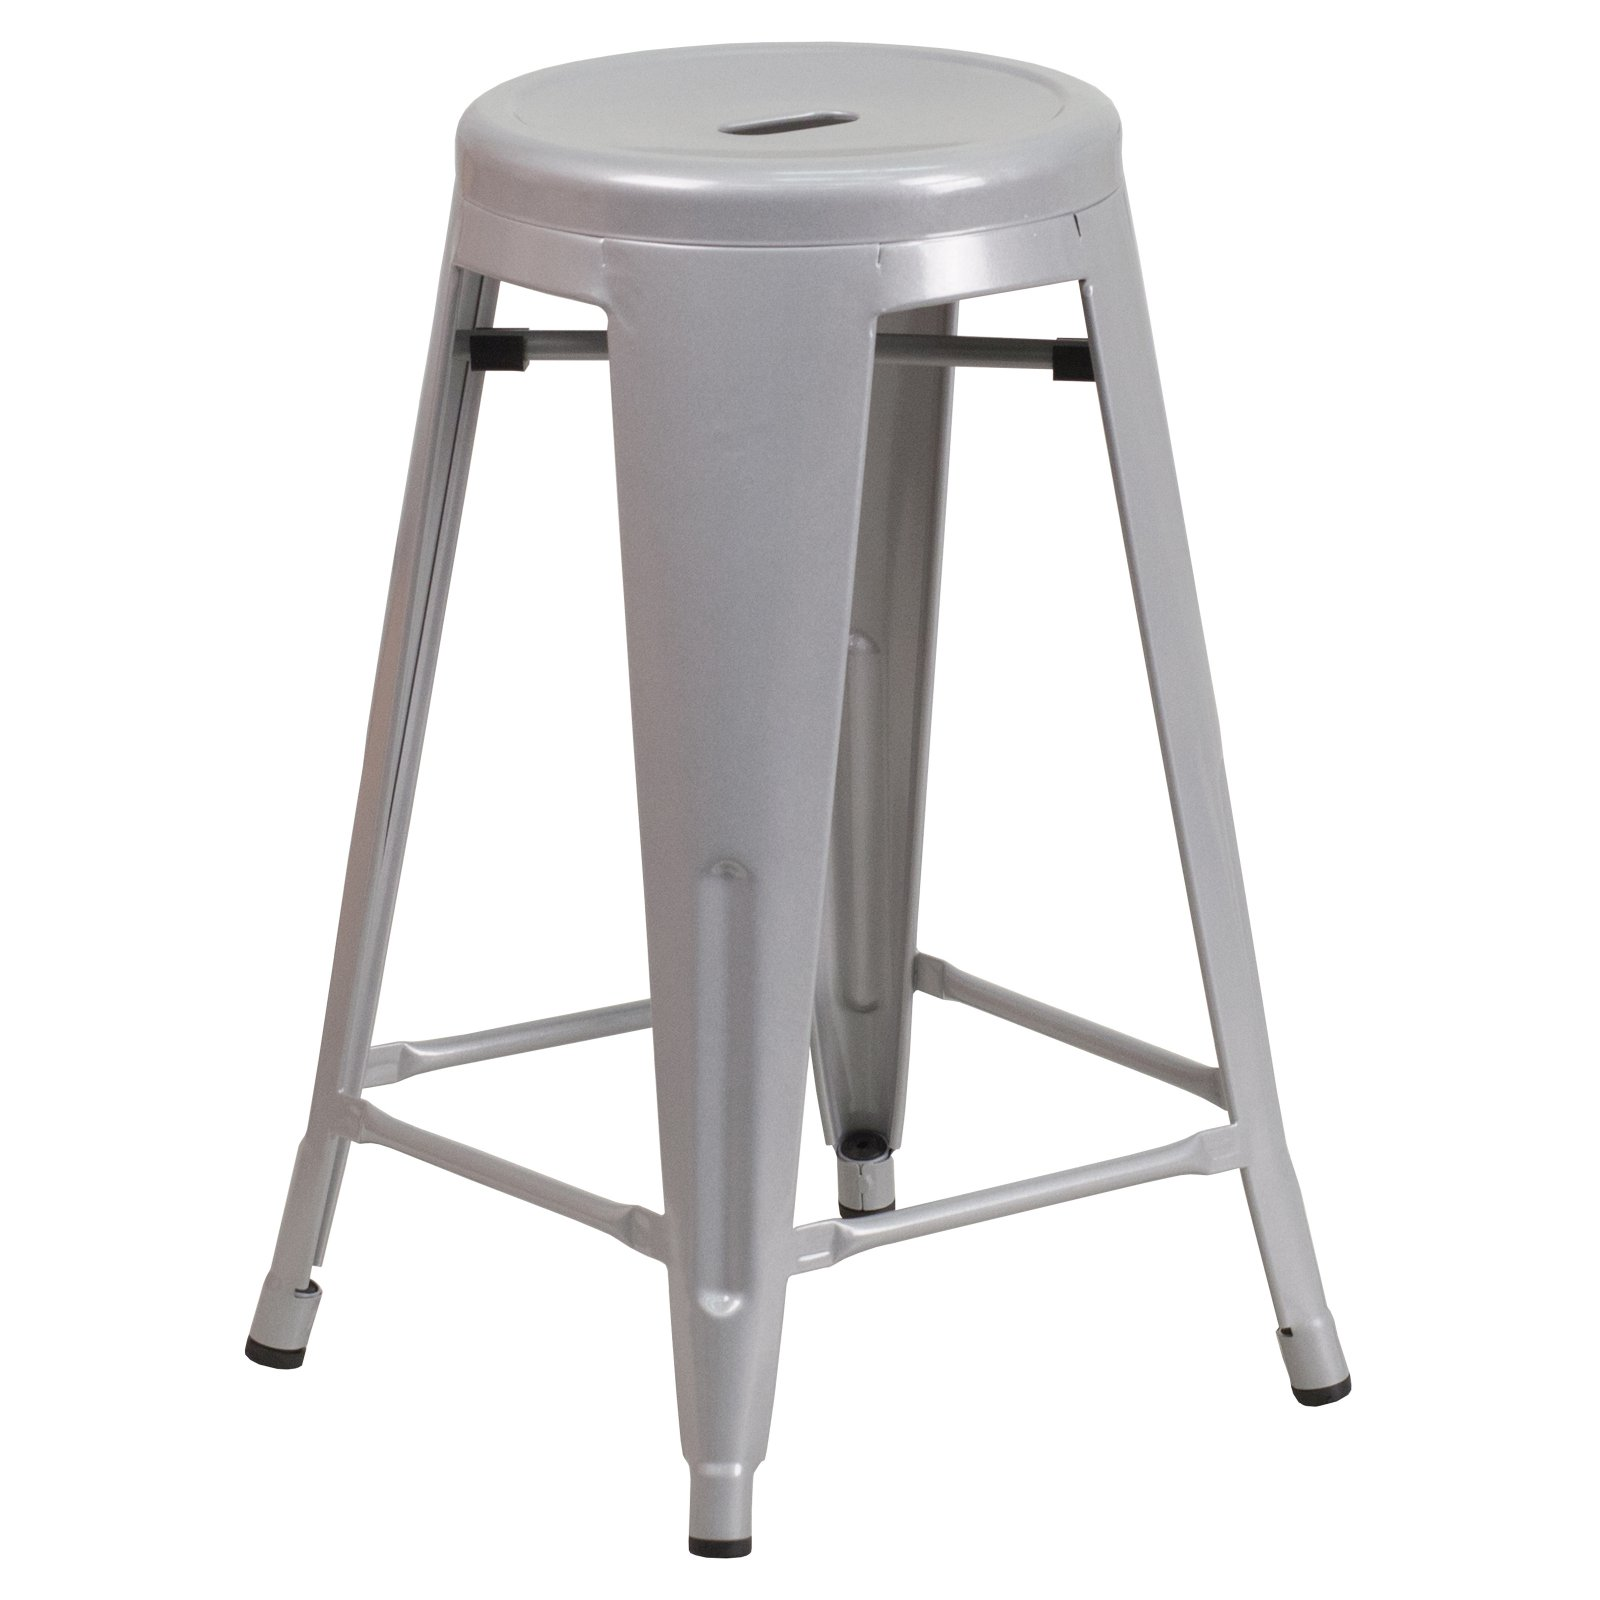 Flash Furniture Carlisle 24 in. Metal Counter Stool